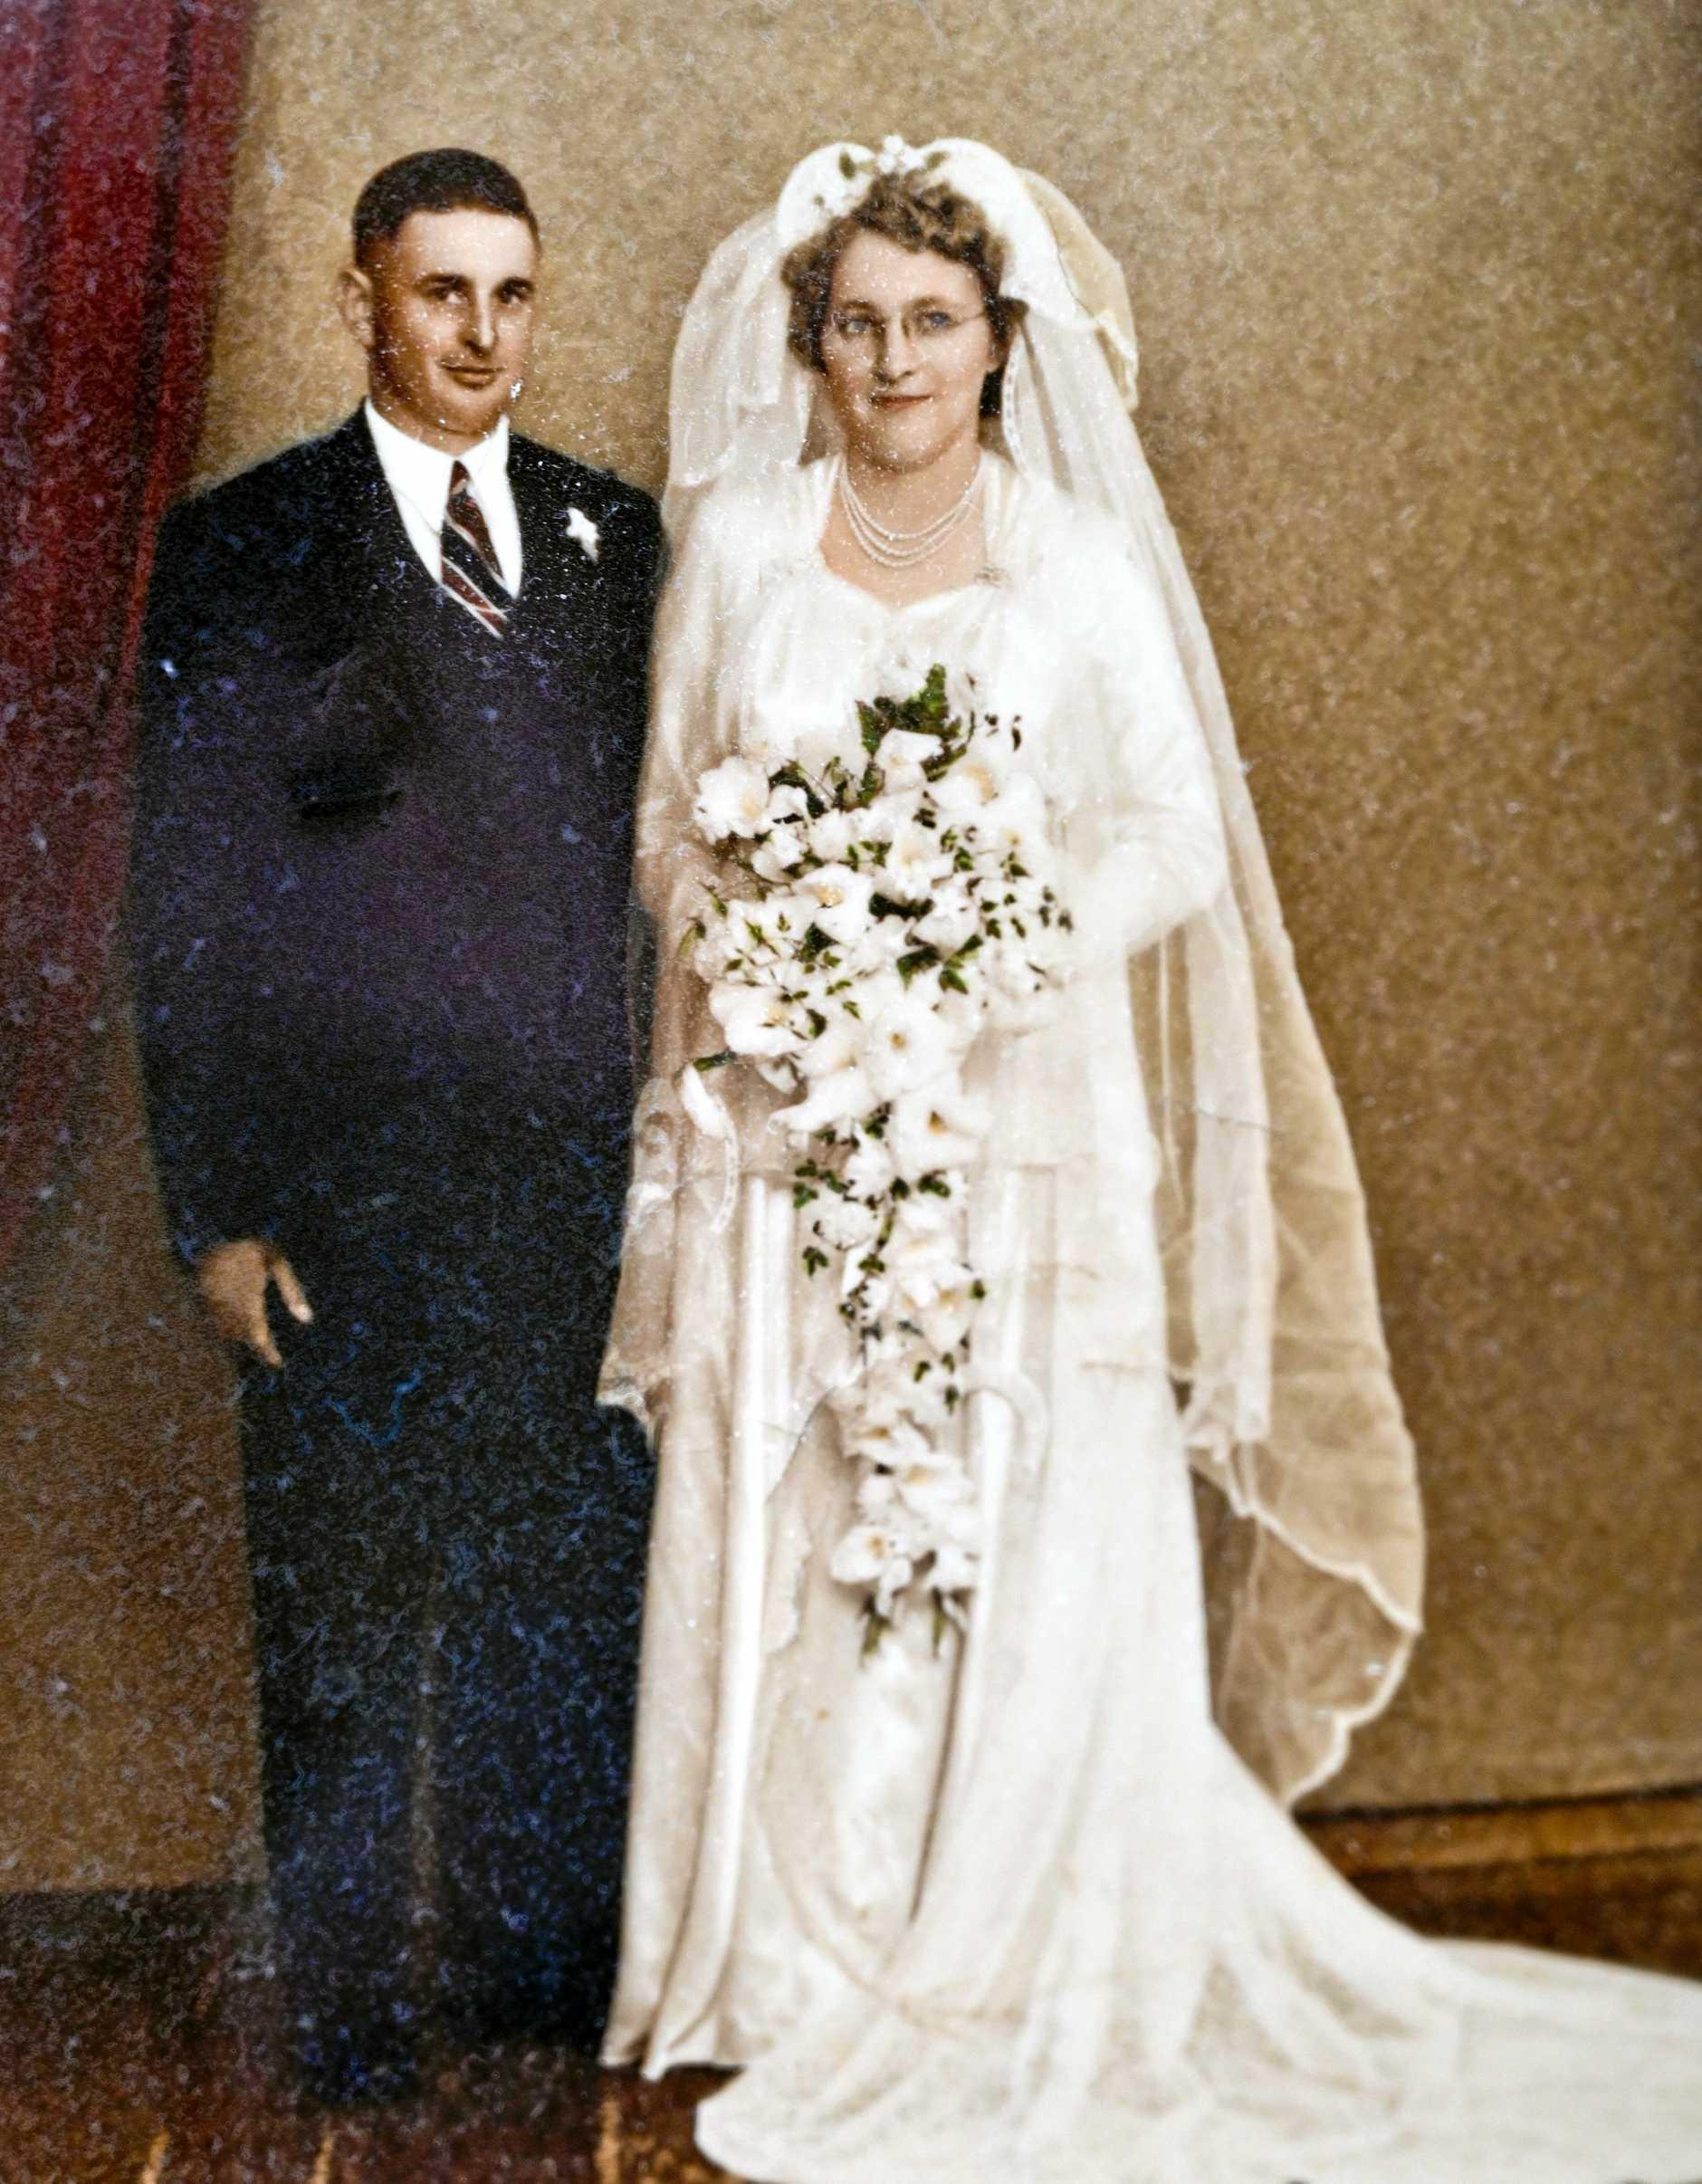 Dulcie Badrick celebrated her 90th birthday on Sunday along with her 68th wedding anniversary to her late husband, John Badrick.